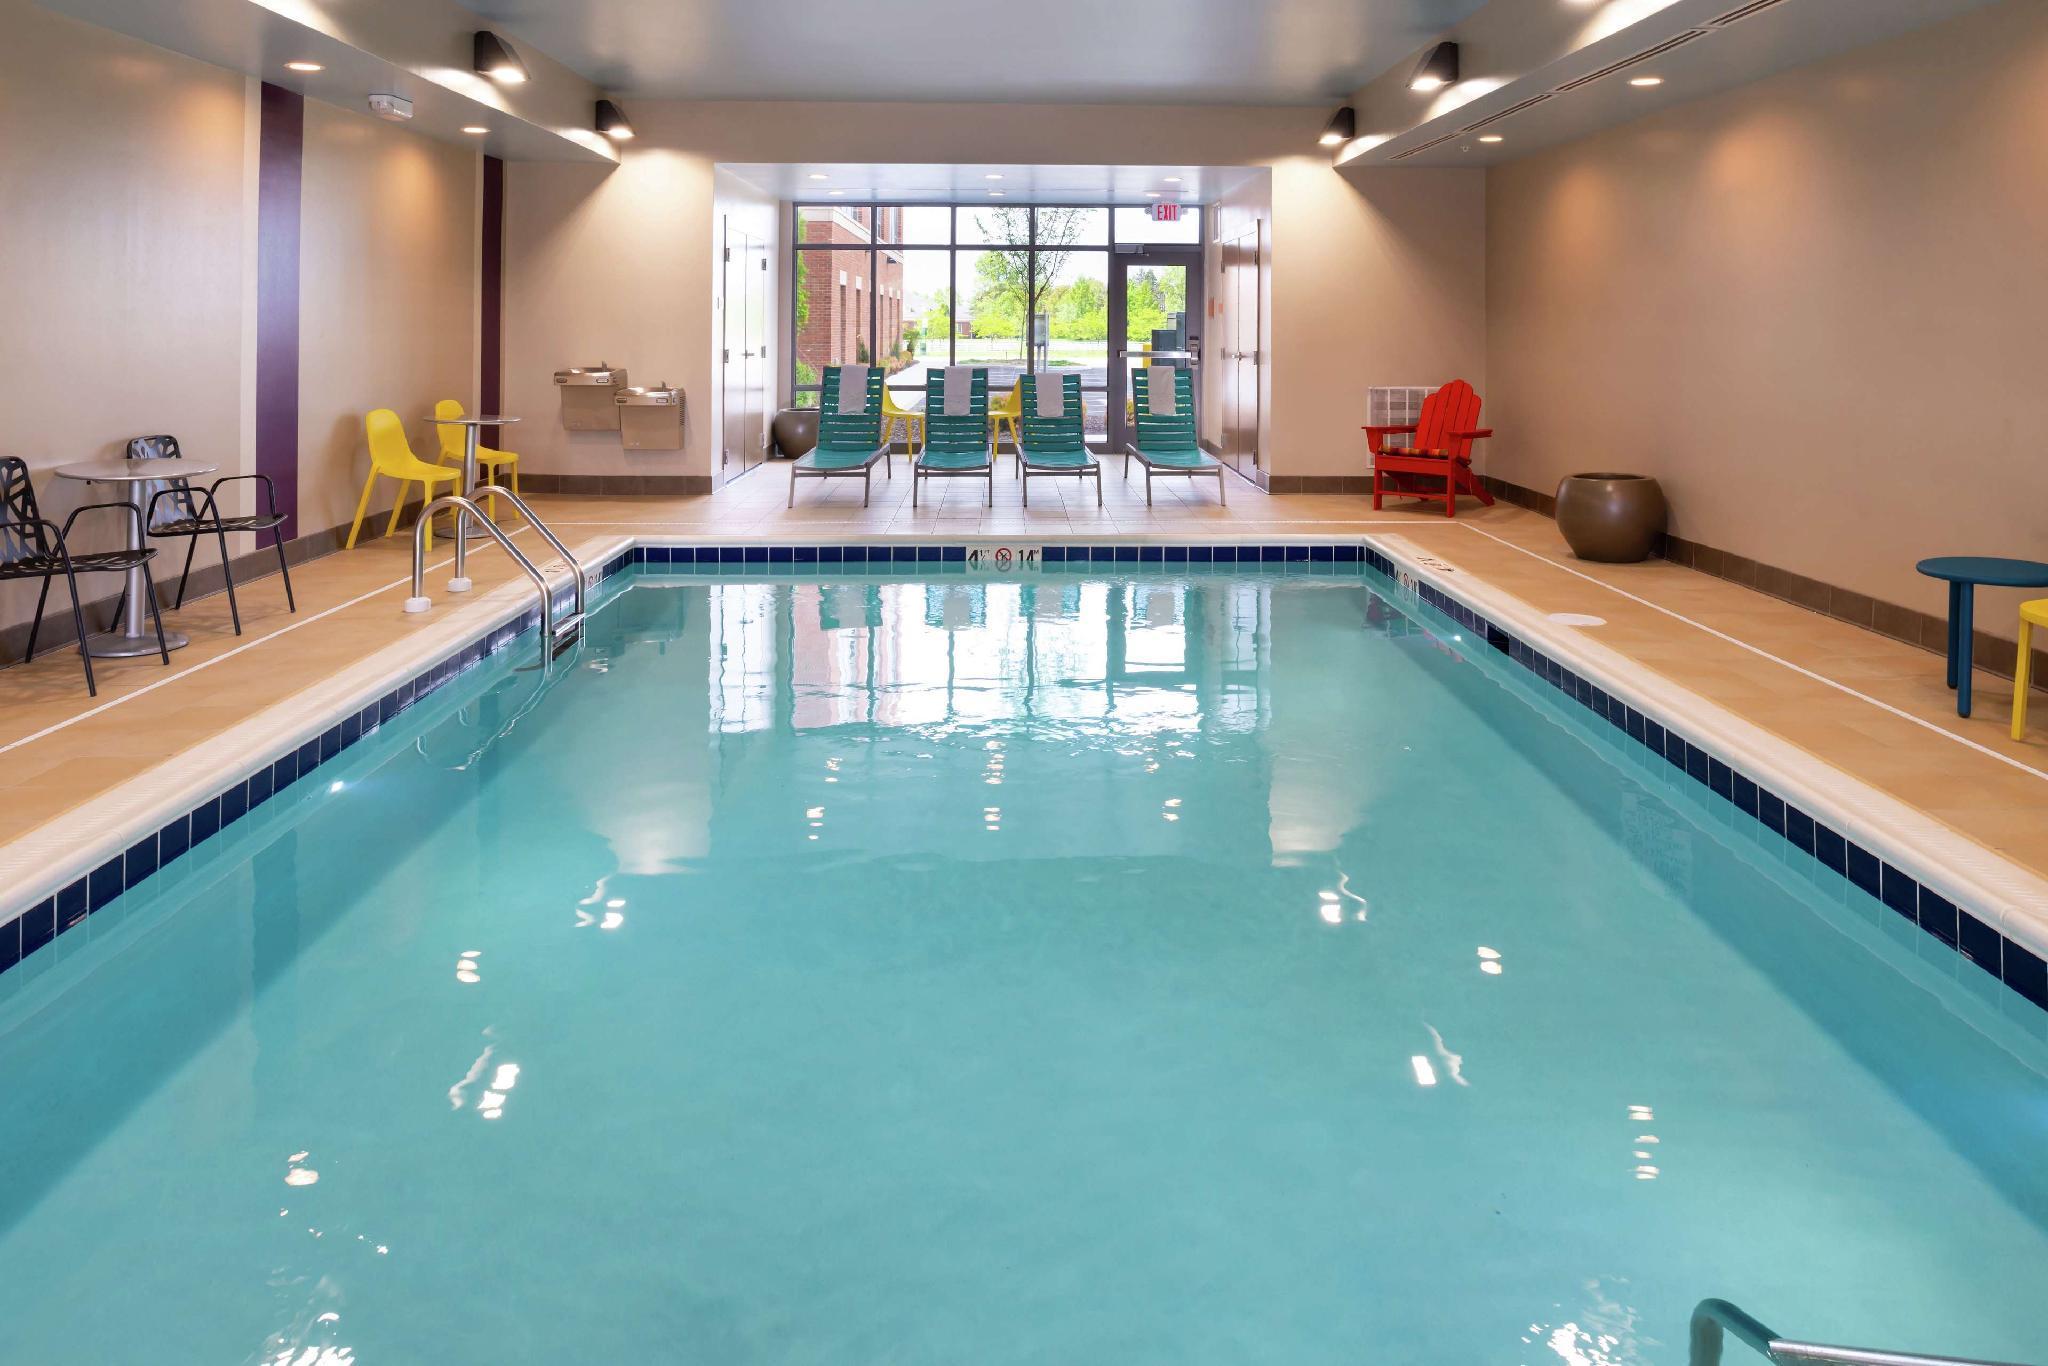 Home2 Suites by Hilton Columbus/West, OH